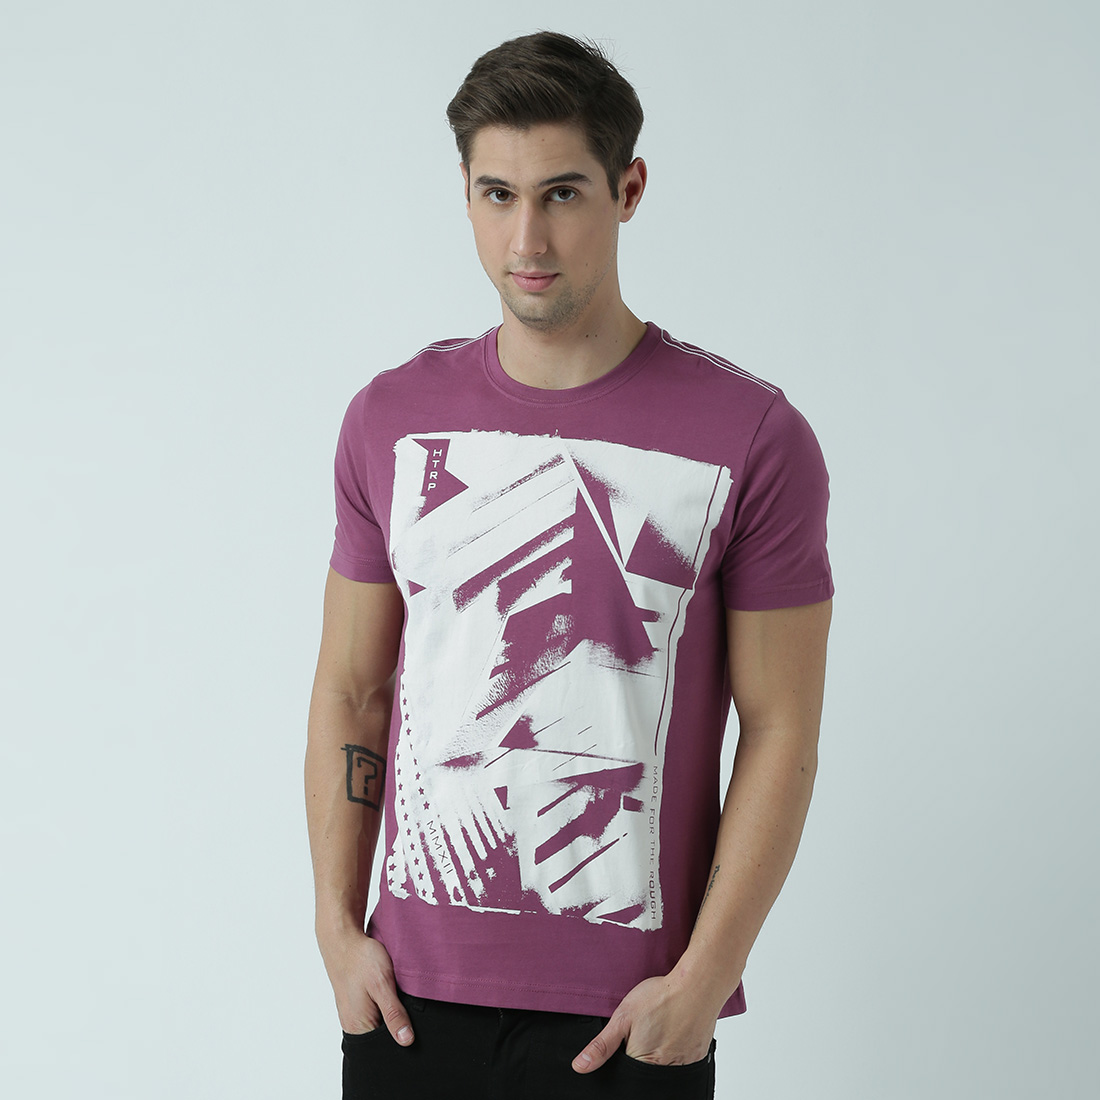 HUETRAP   Huetrap Mens Be differentRound neck graphic print Tshirt